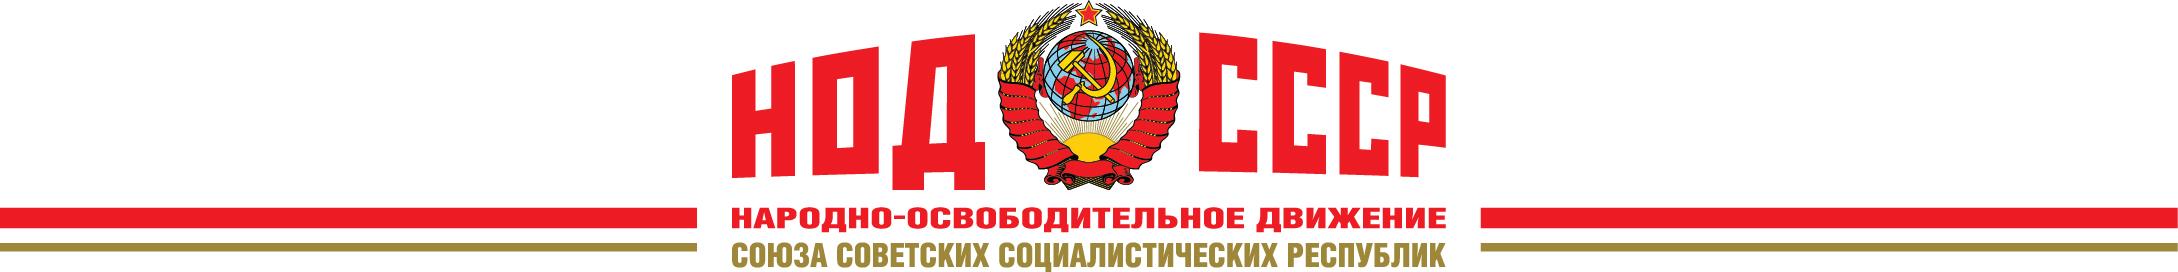 Организация объединённых наций, оон